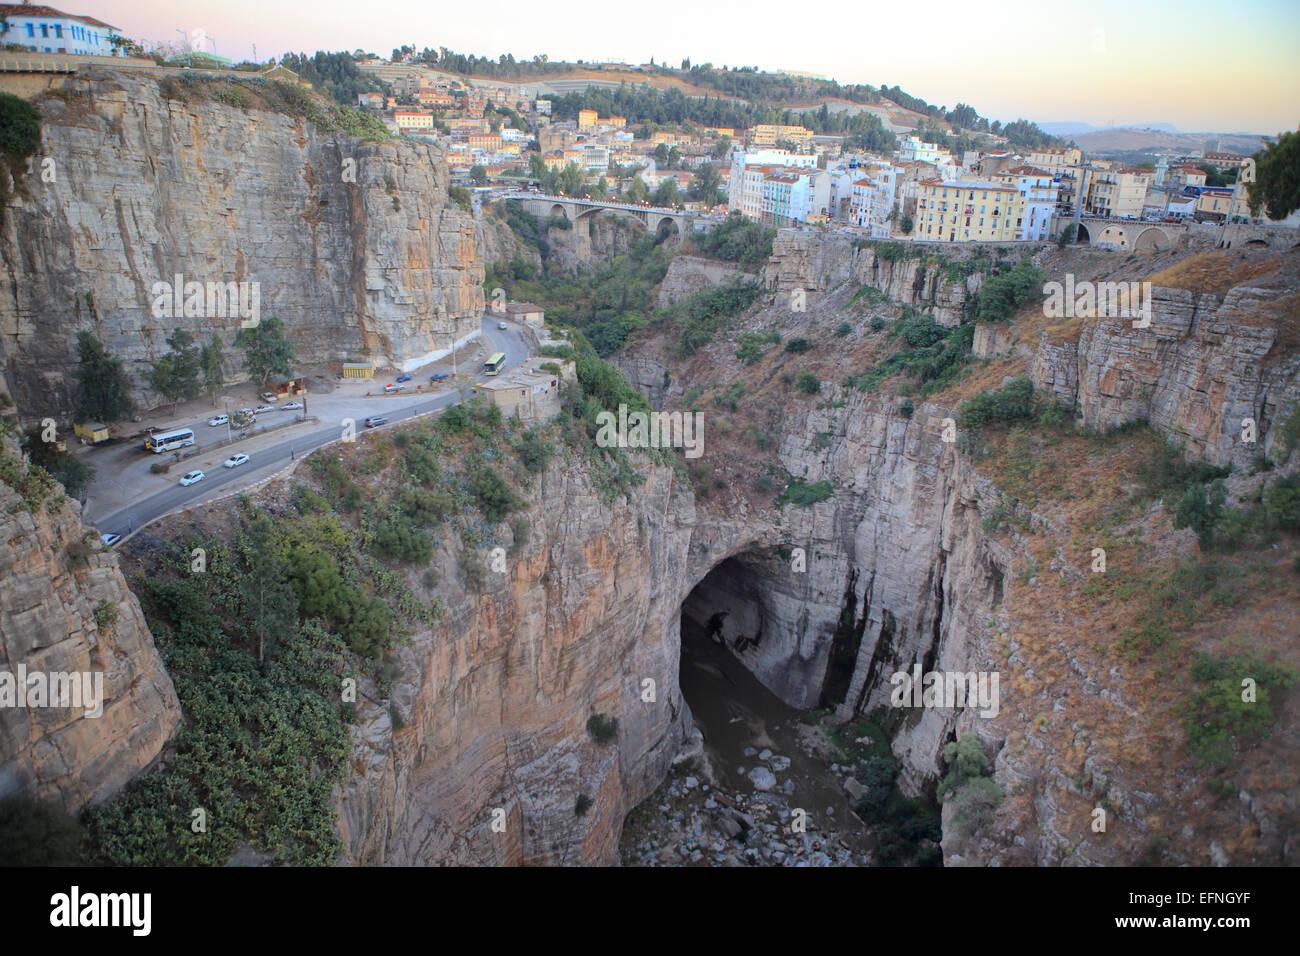 Rhummel river canyon, Costantino, Algeria Immagini Stock